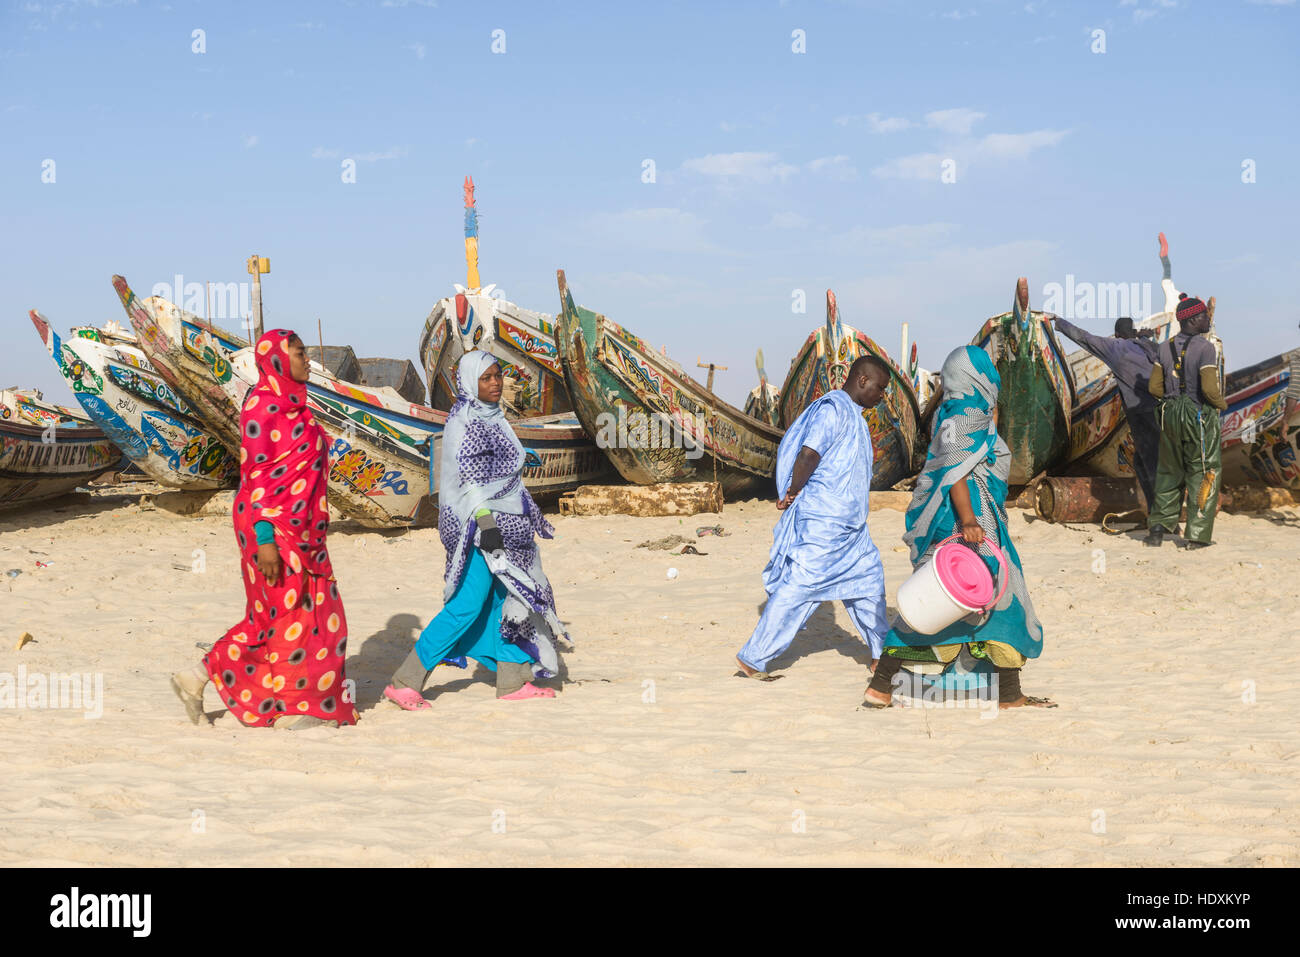 FIshermen, peddlers, boats in Nouakchott's famous fish market - Stock Image